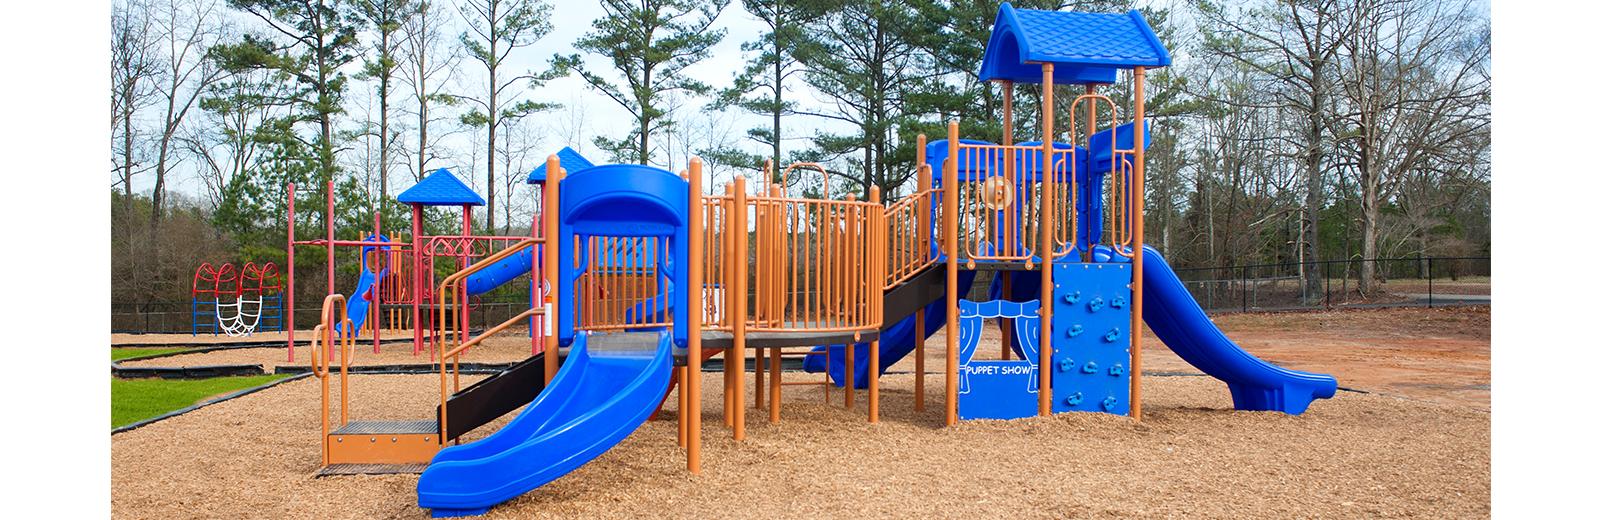 sandy-hill-elementary-playground-equipment